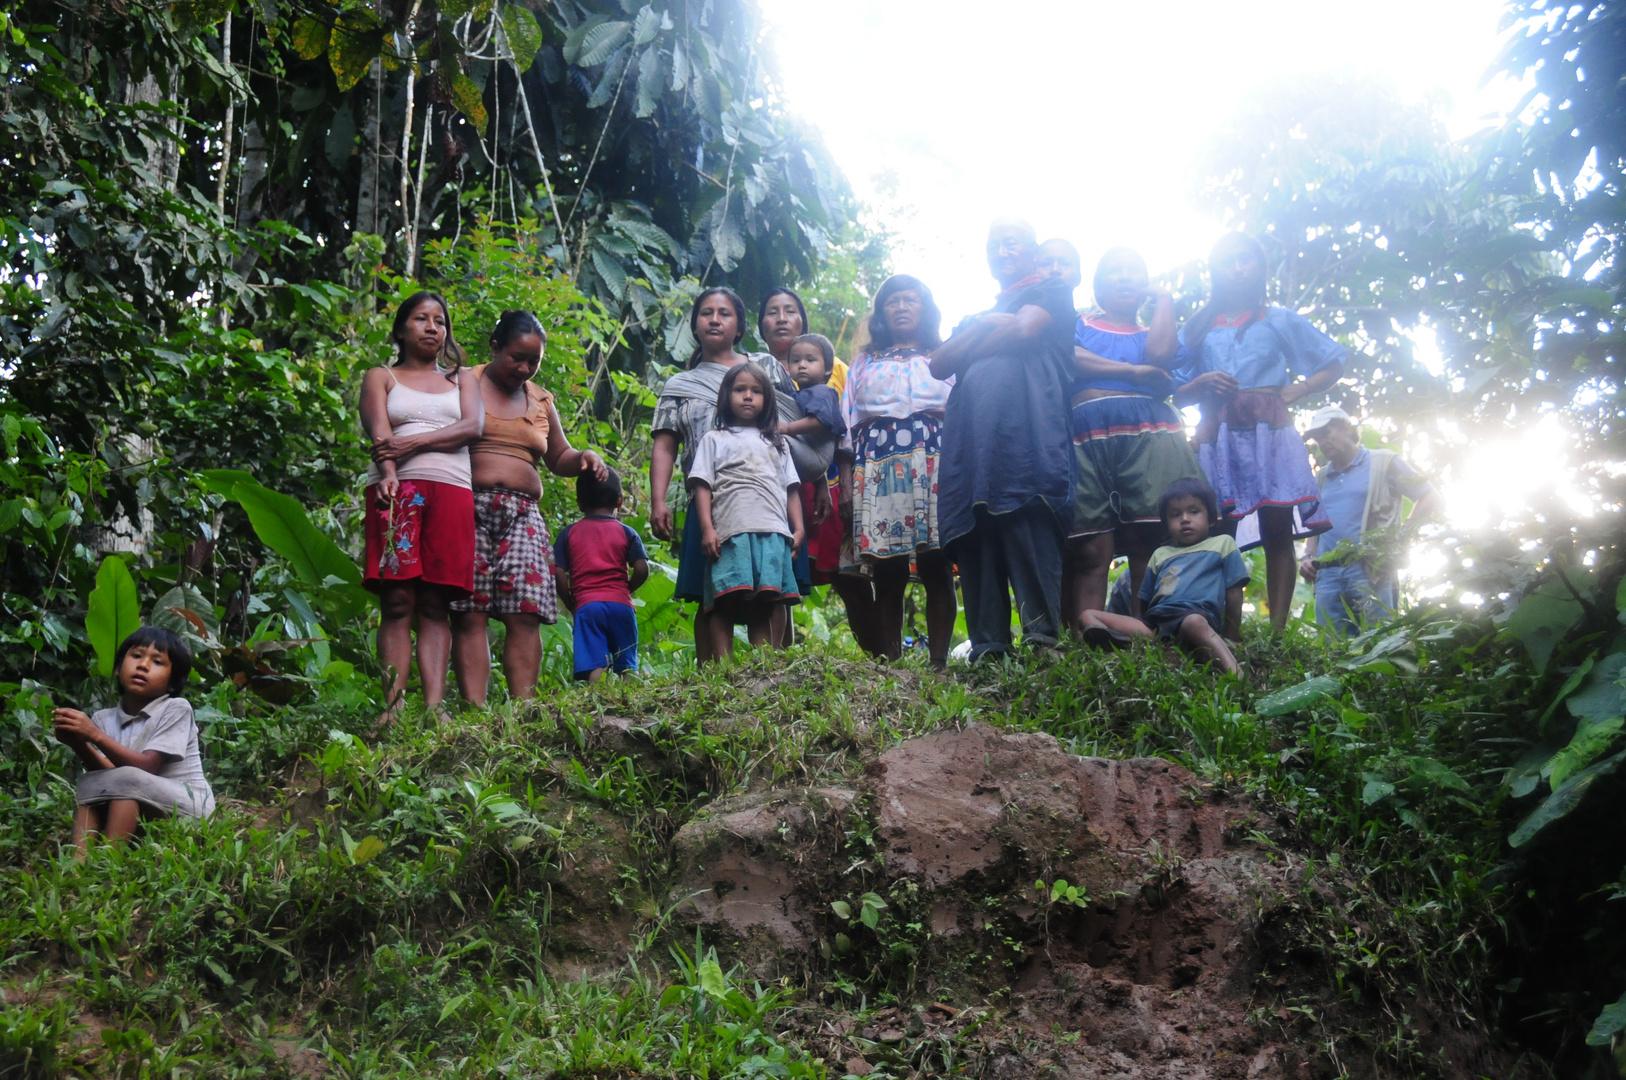 The Cofan Tribe says Goodbye - Cuyabeno, Ecuador